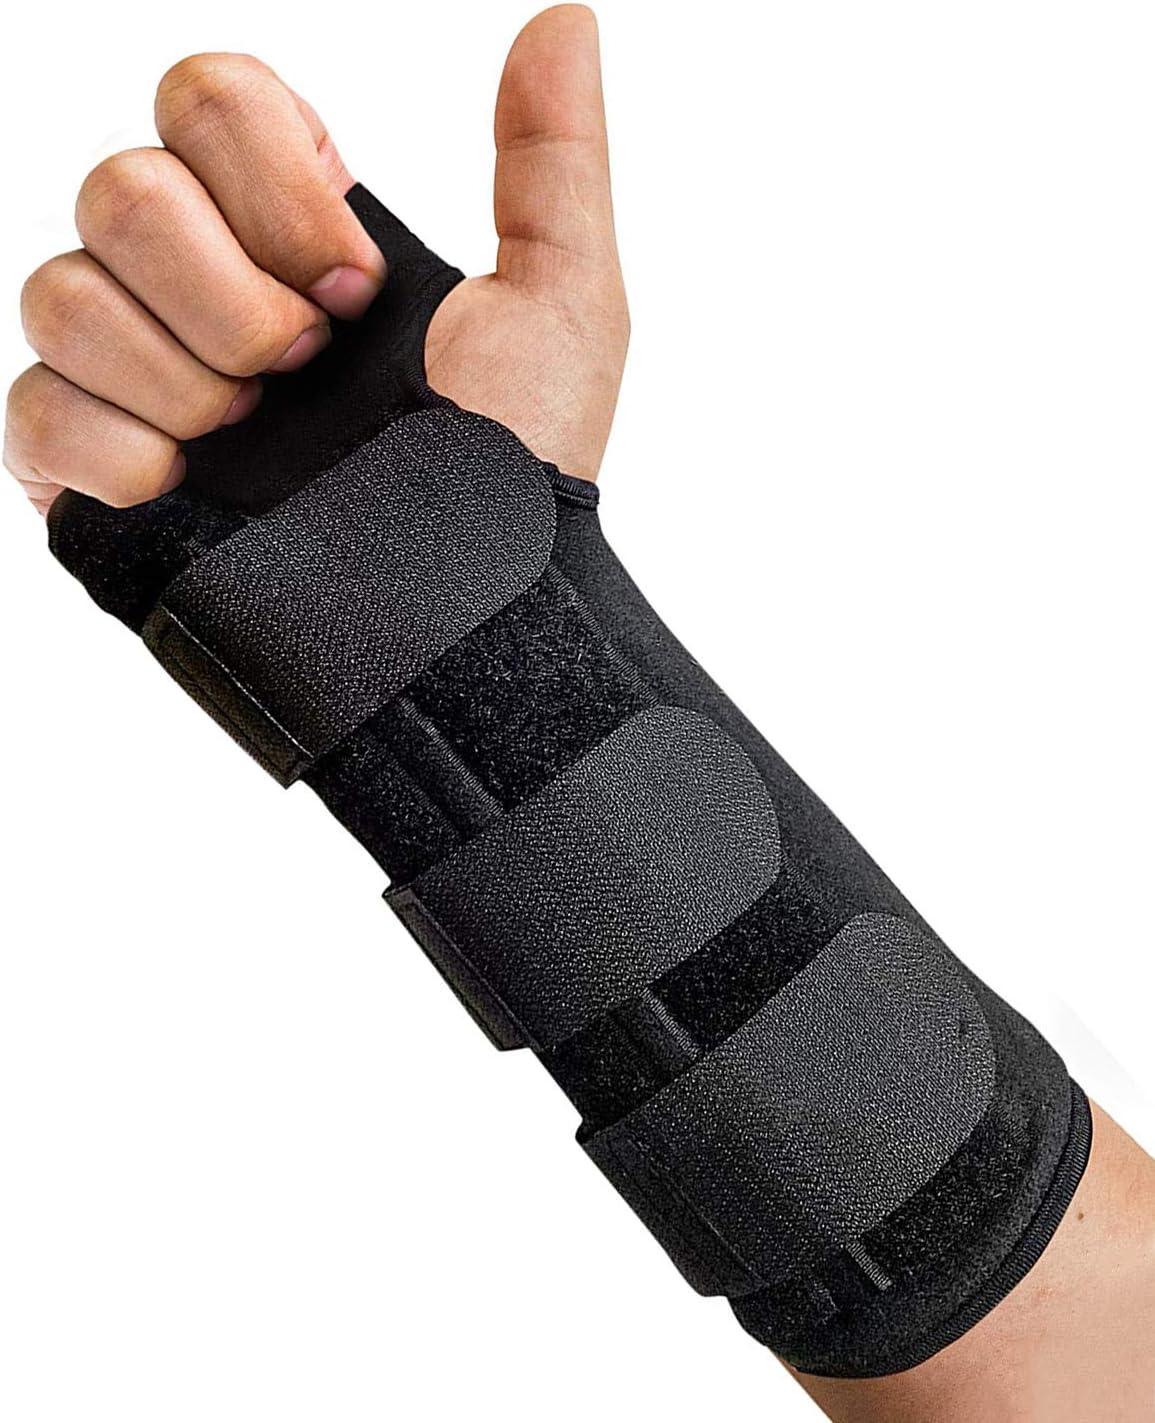 LoveSelfy Órtesis Muñequera Transpirable, Férula Soporte Muñeca Ortopedica Ajustable con Almohadillas Ideal para Artritis Túnel Carpiano Tendonitis NHS Esguince Frac